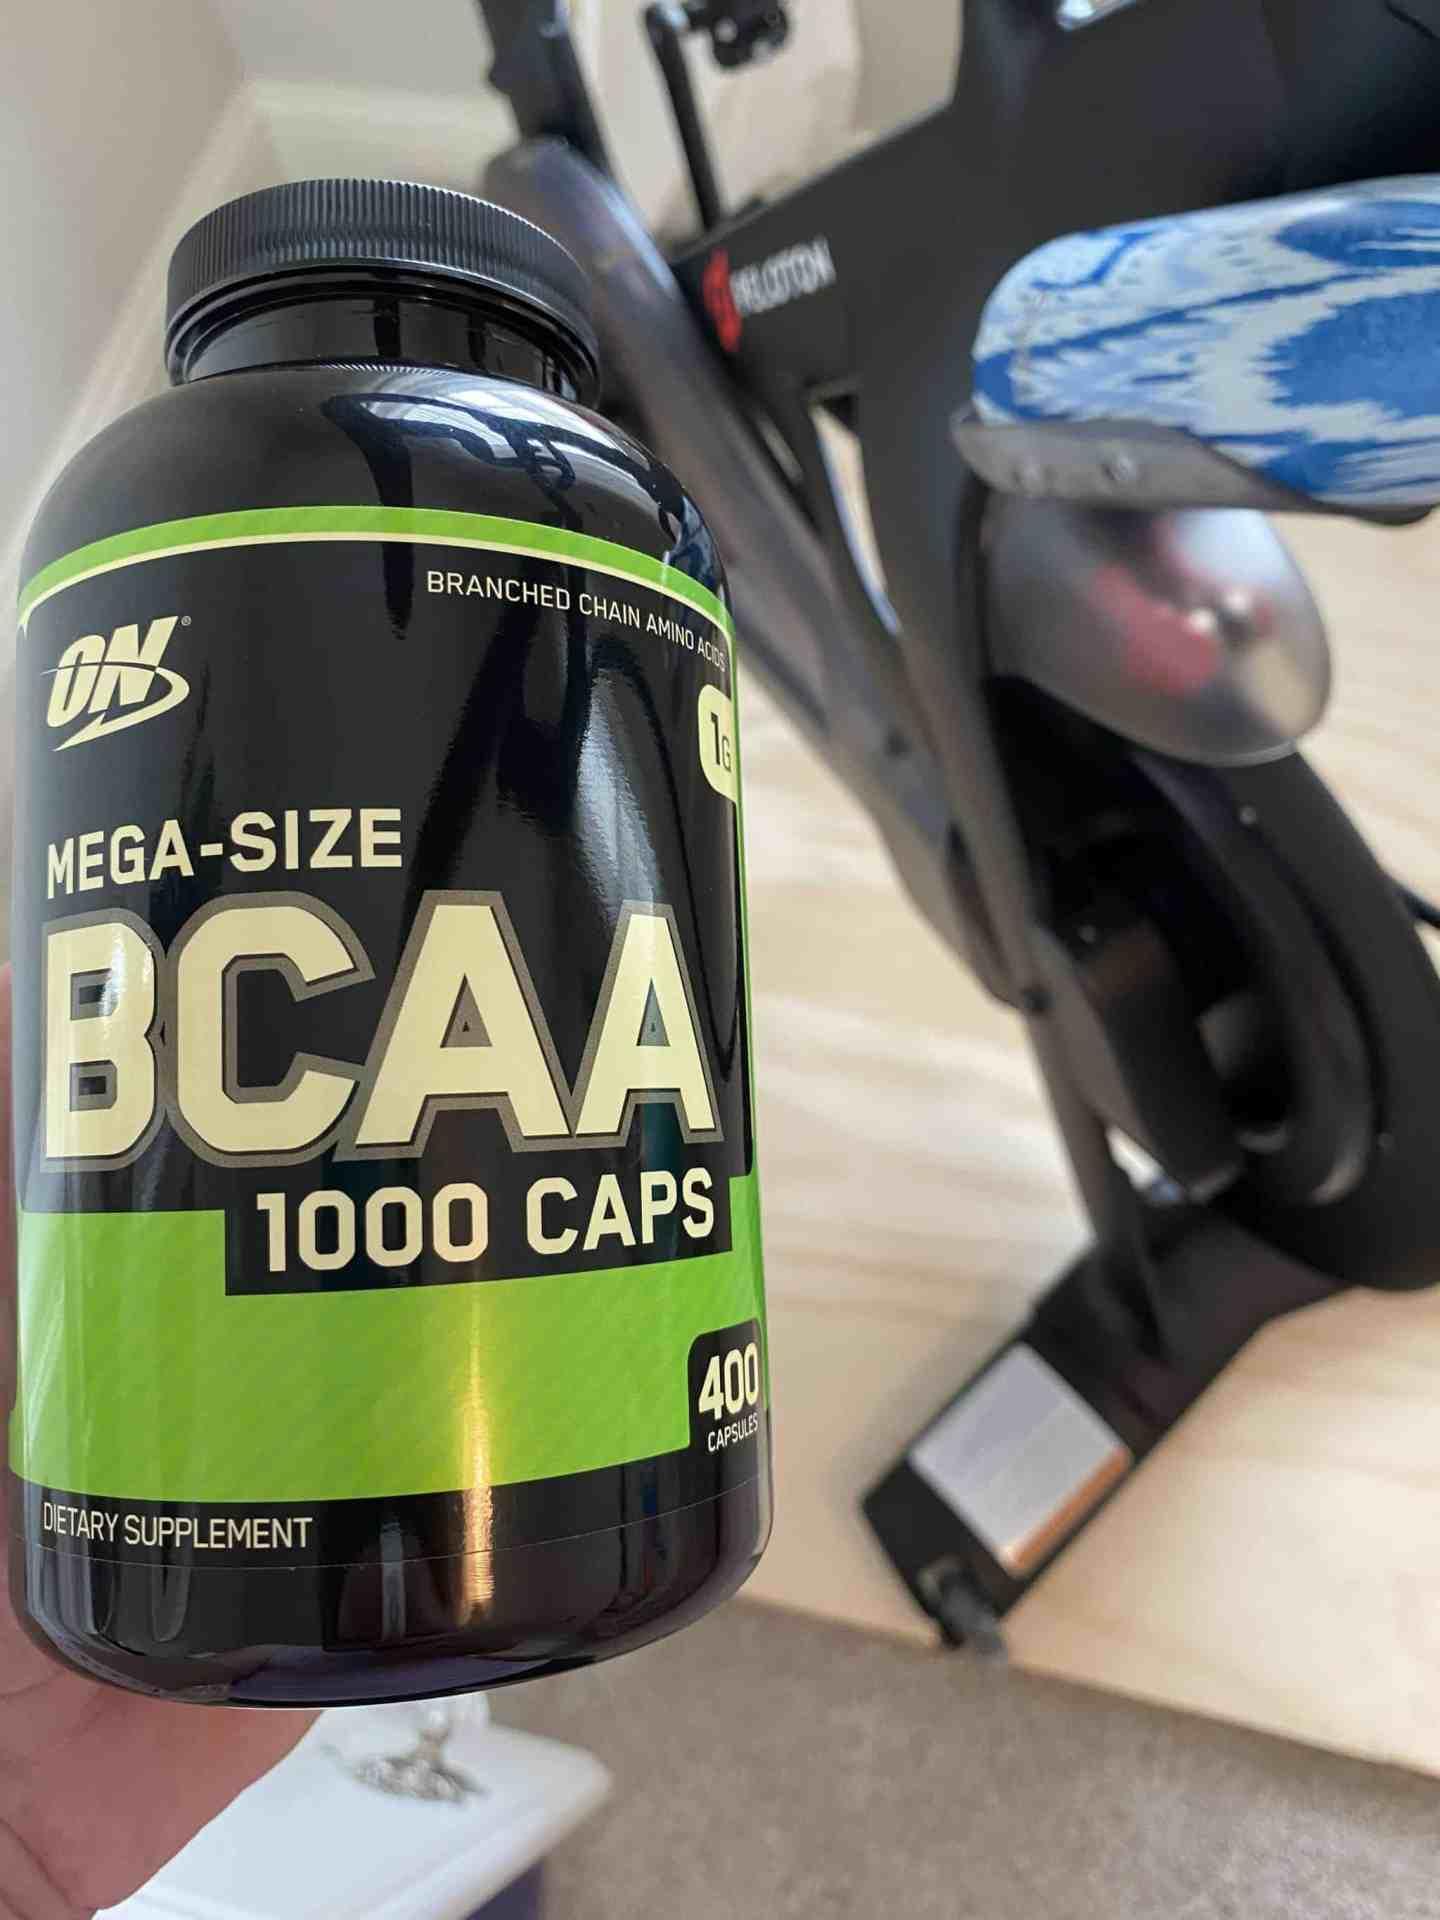 BCAA-branch-chain-amino-acids